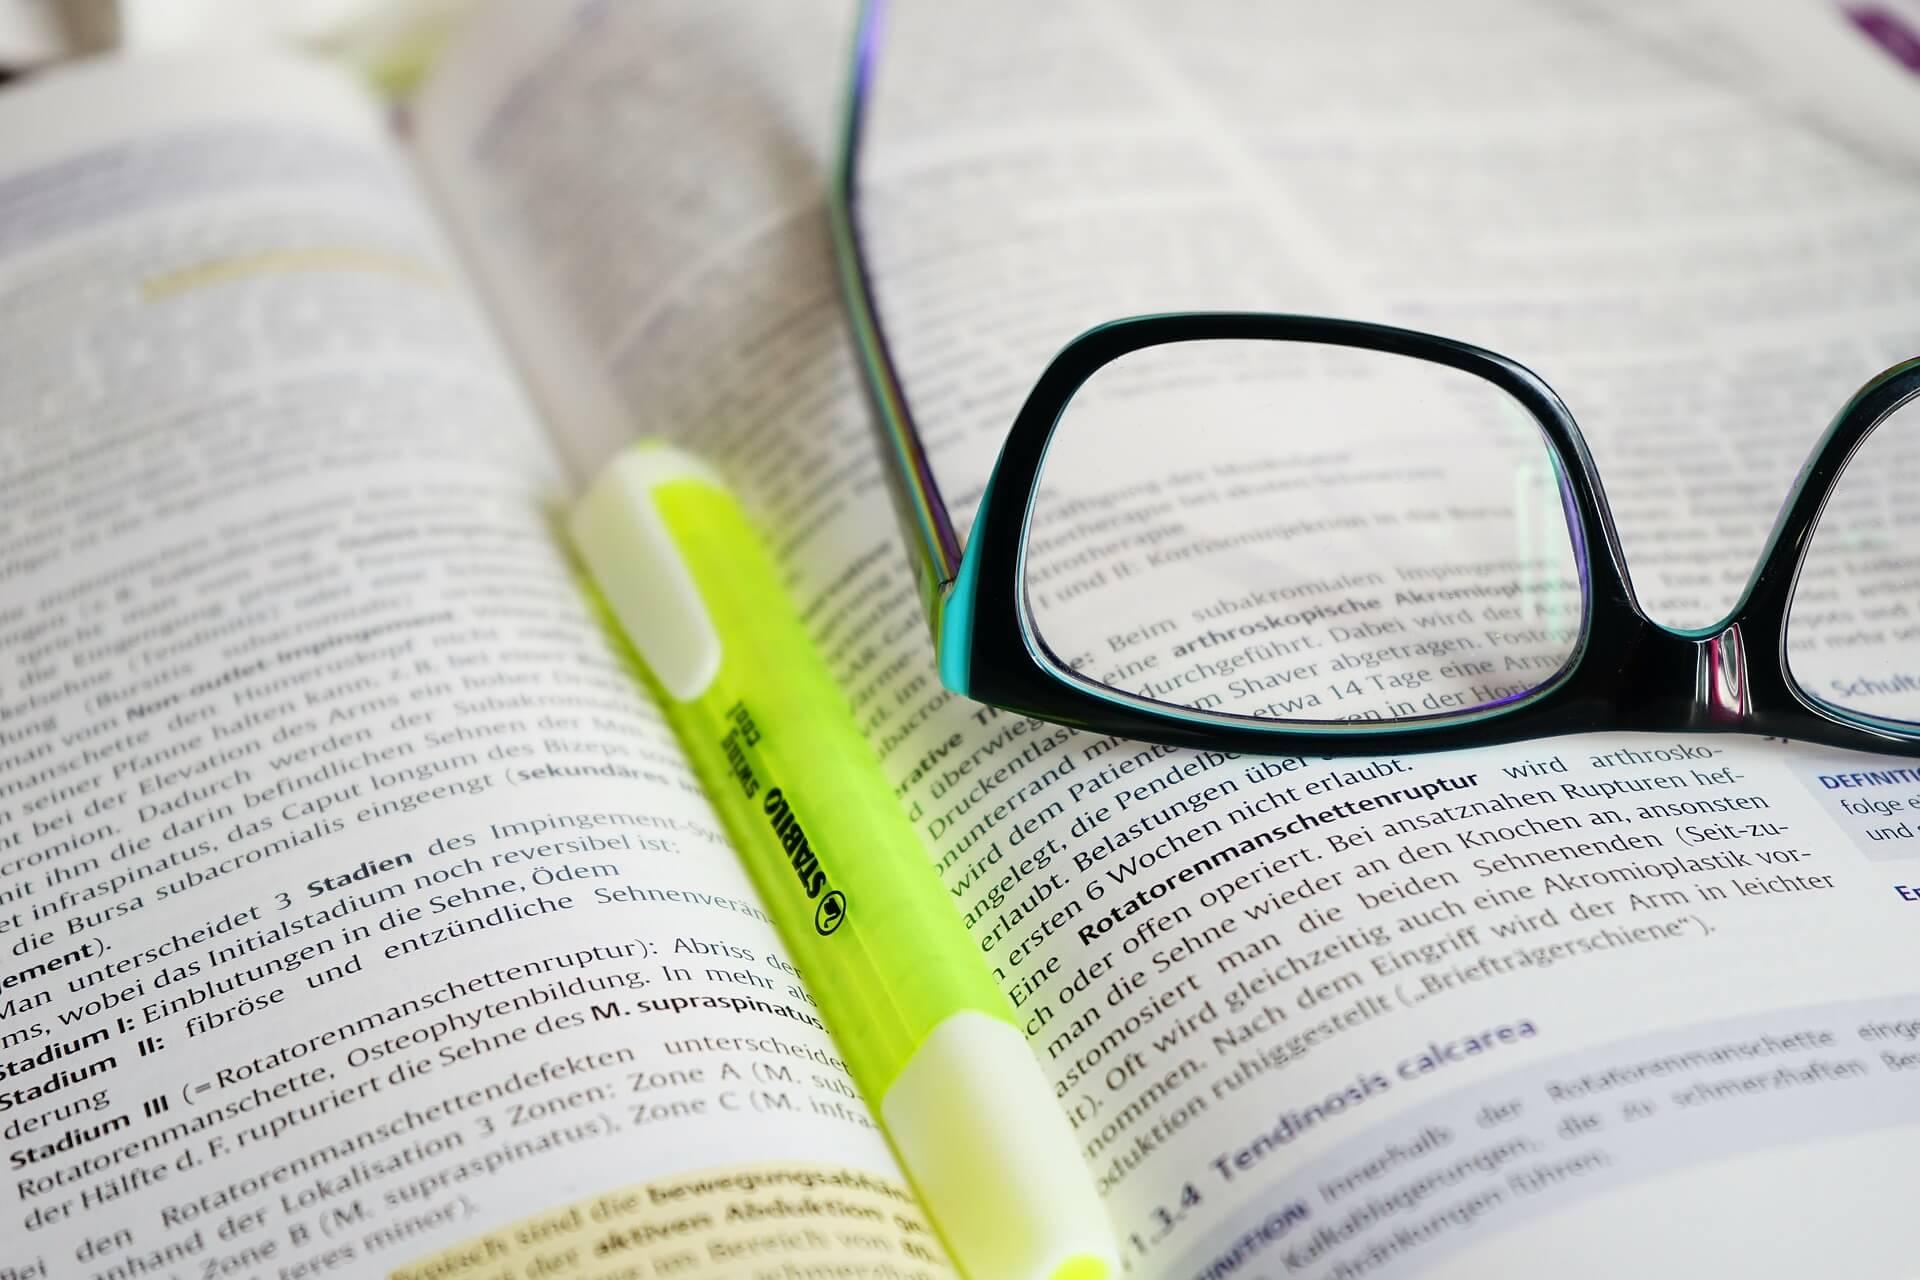 Lesebrille beim Studium auf dem Fachbuch (c) Hans / pixabay.de